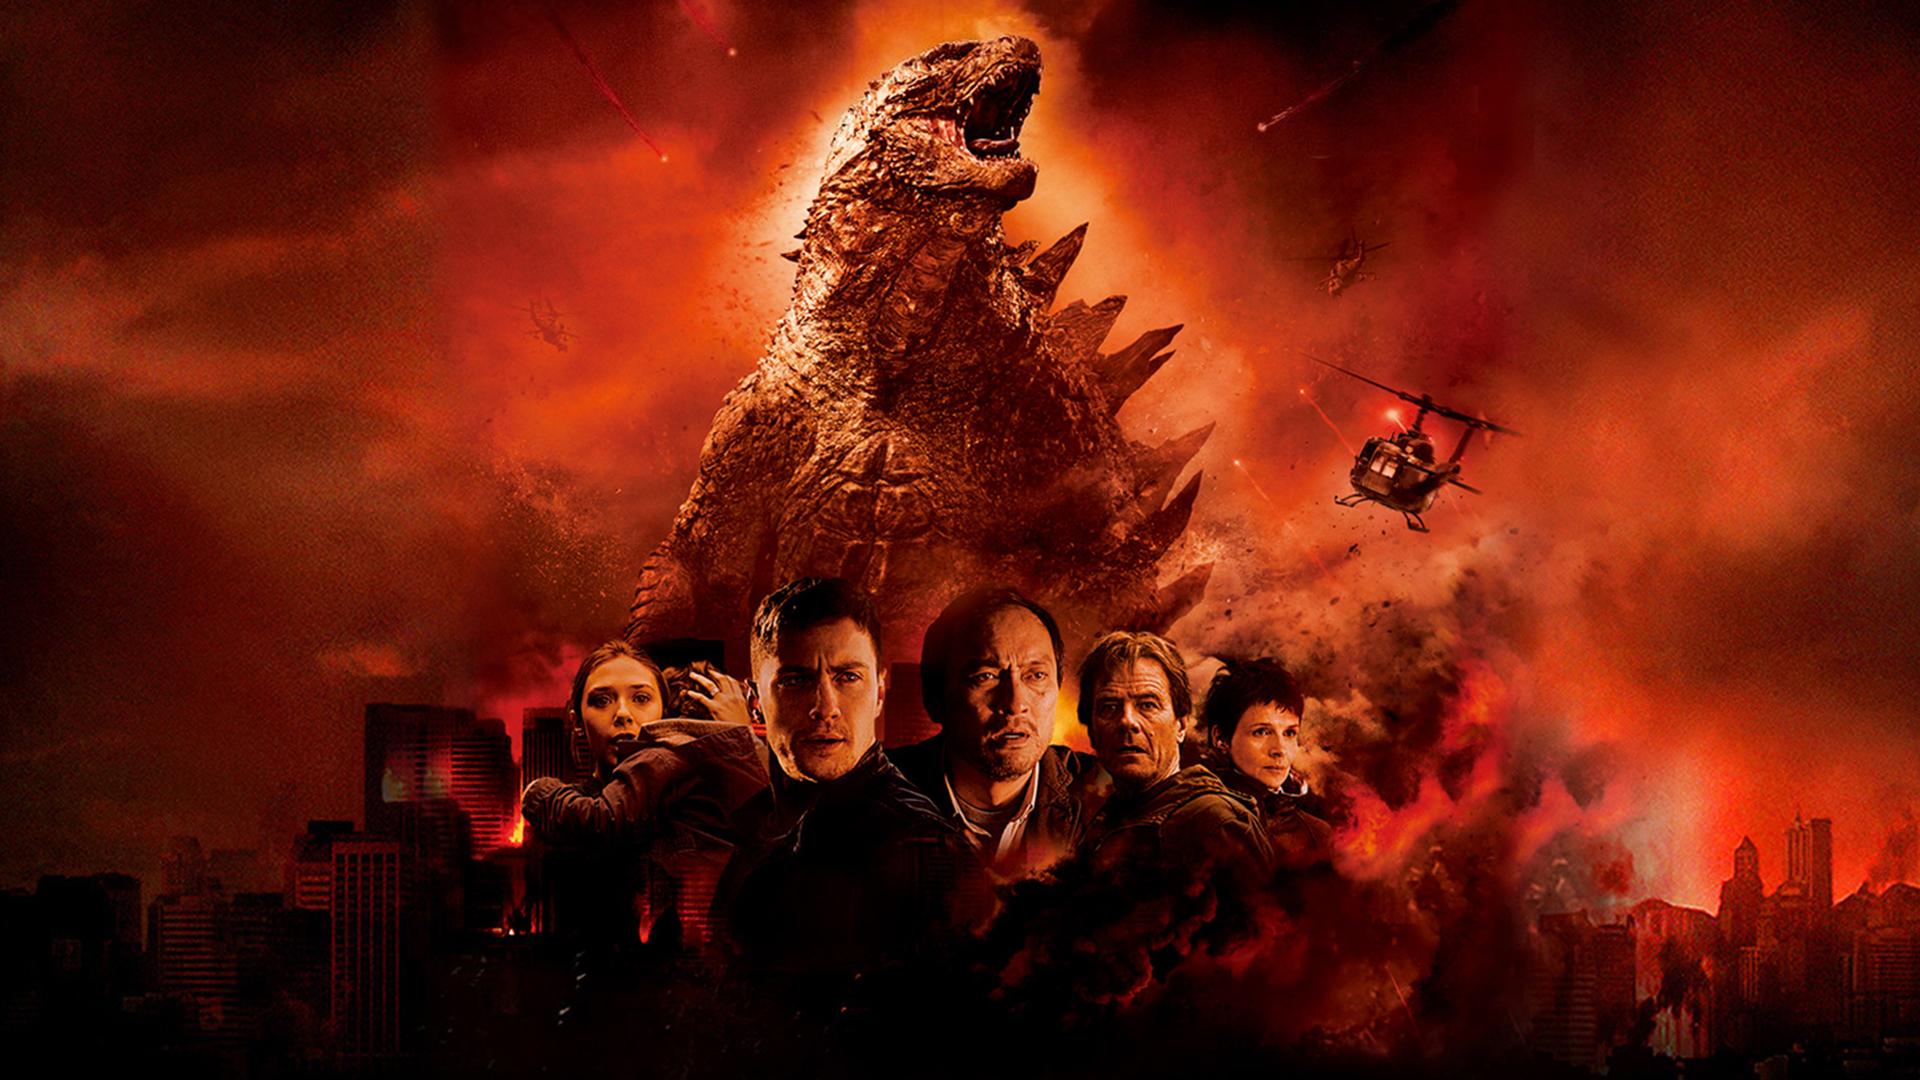 Godzilla 2014 Wallpaper images 1920x1080